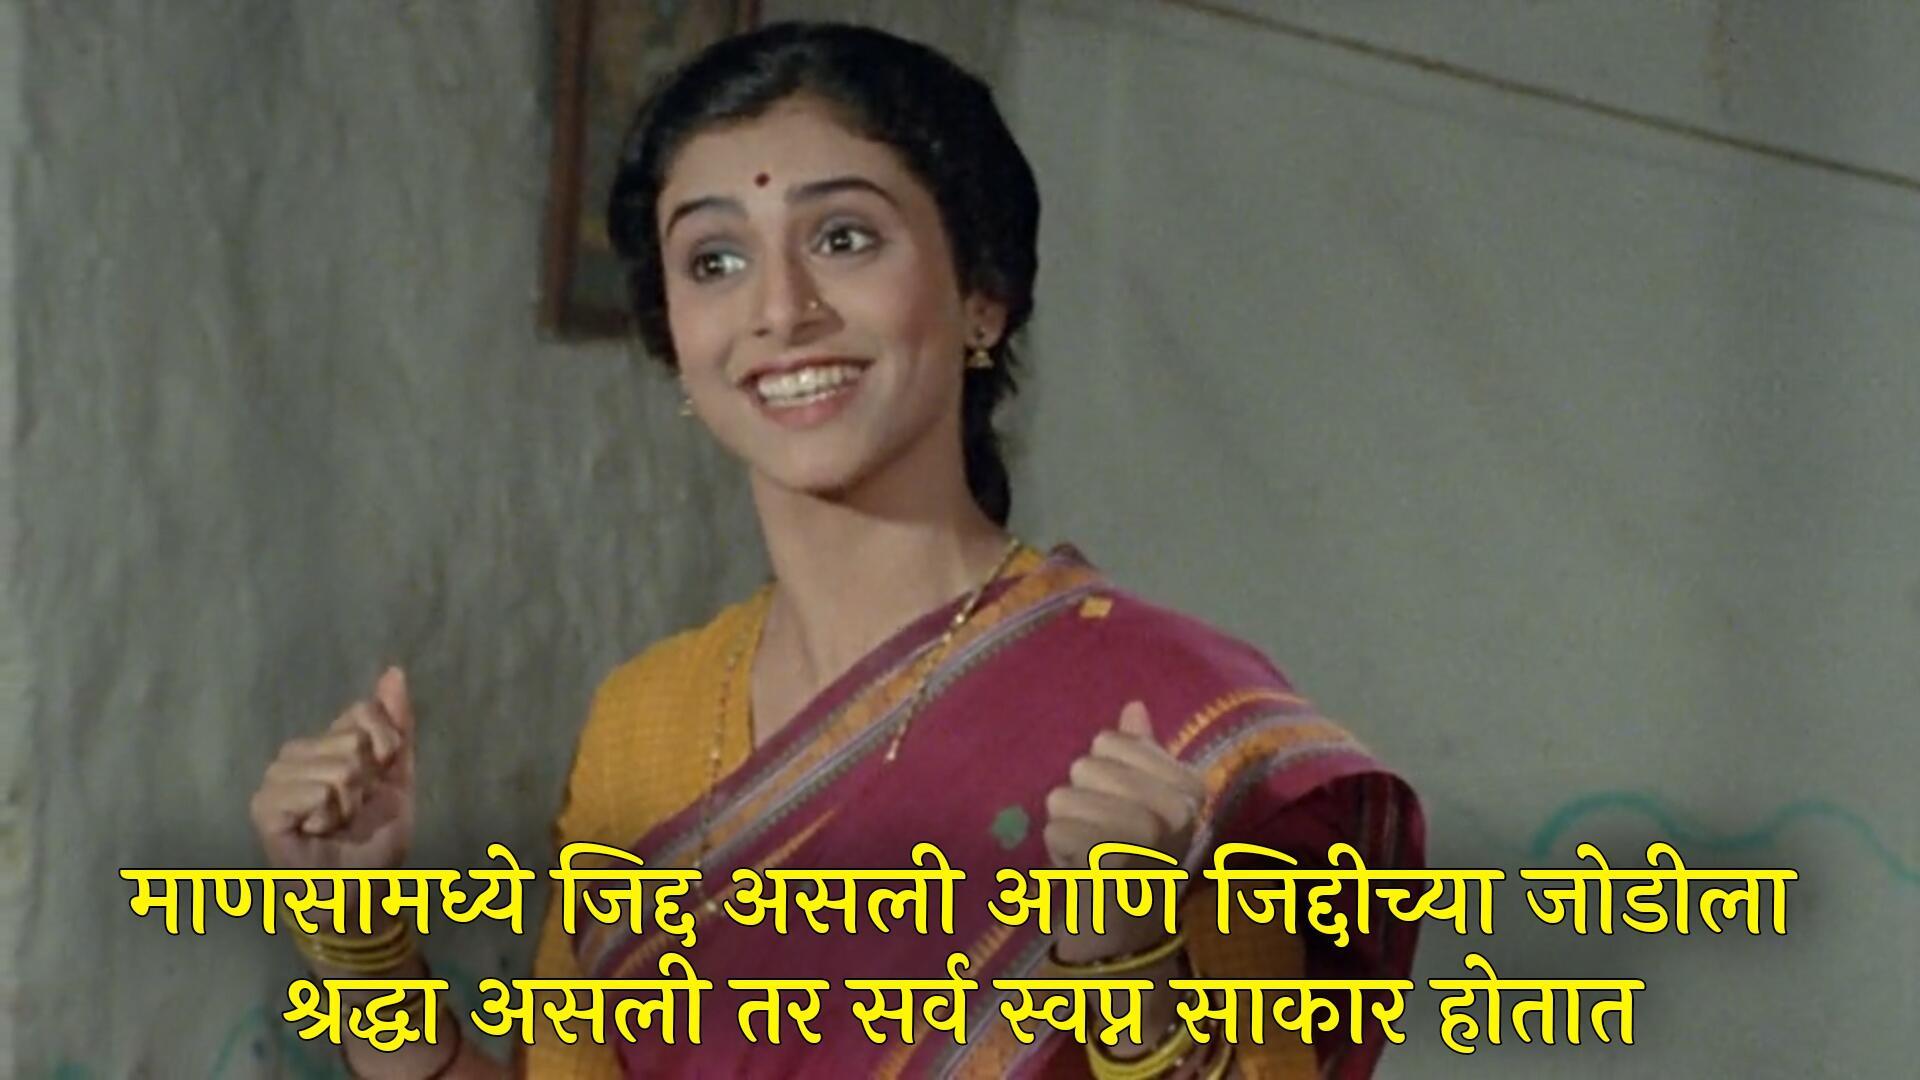 Maza Pati Karodpati Movie Dialogues